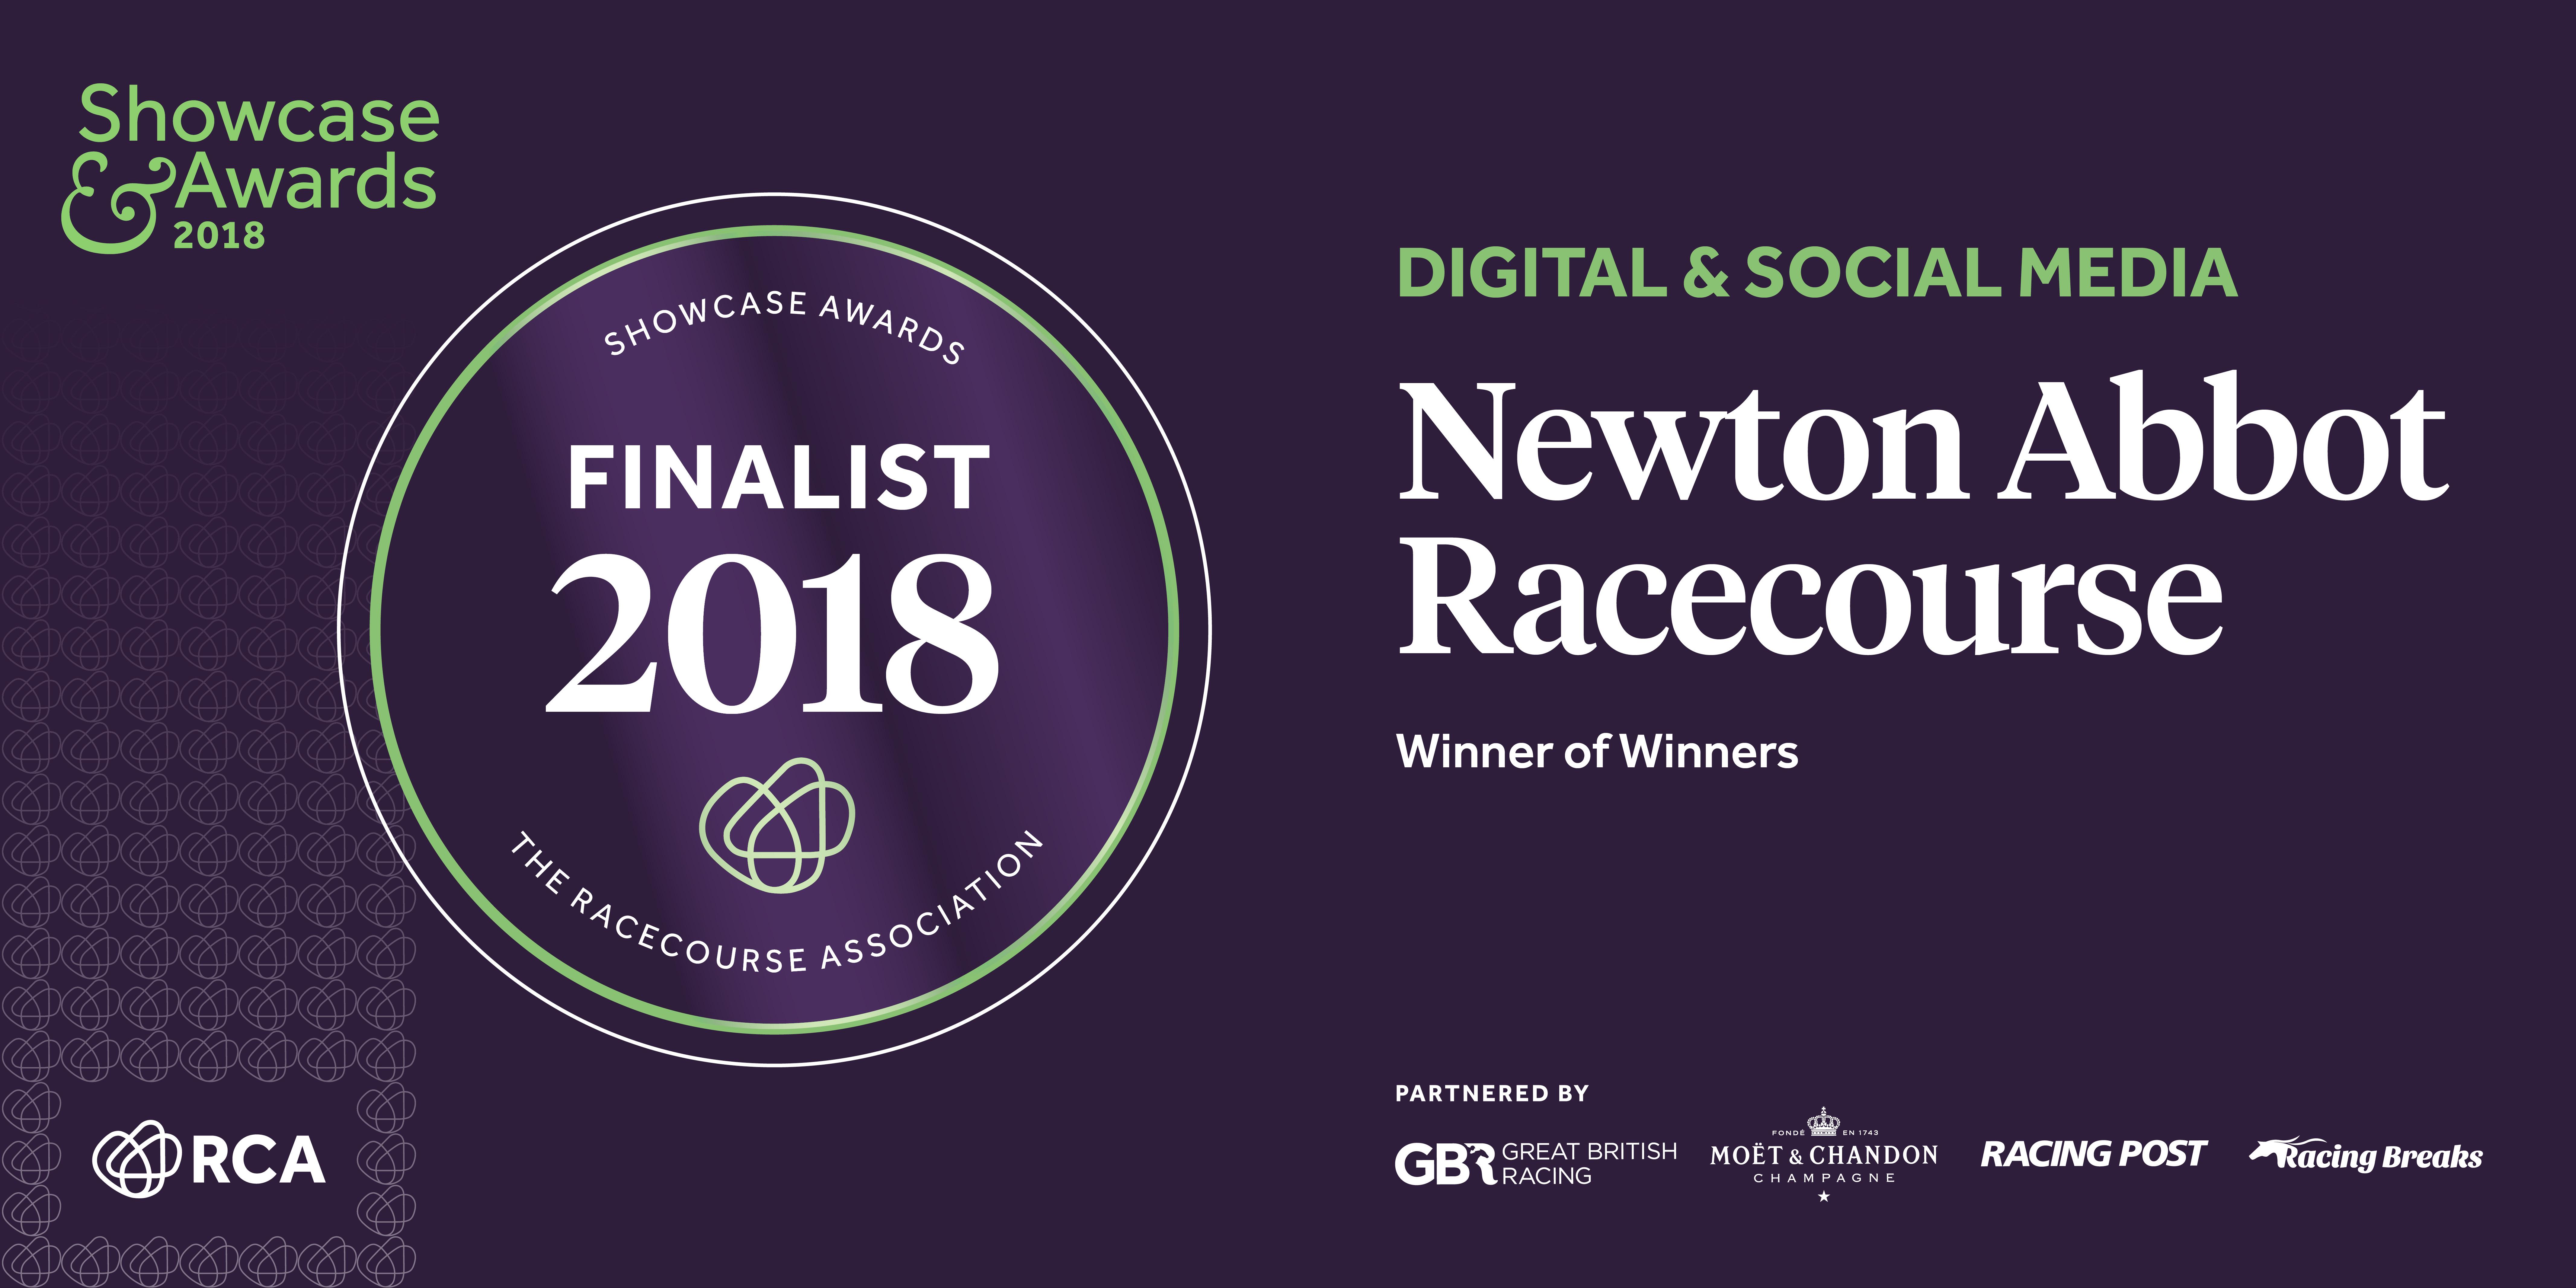 Newton Abbot Racecourse - Showcase & Awards 2018 Finalists